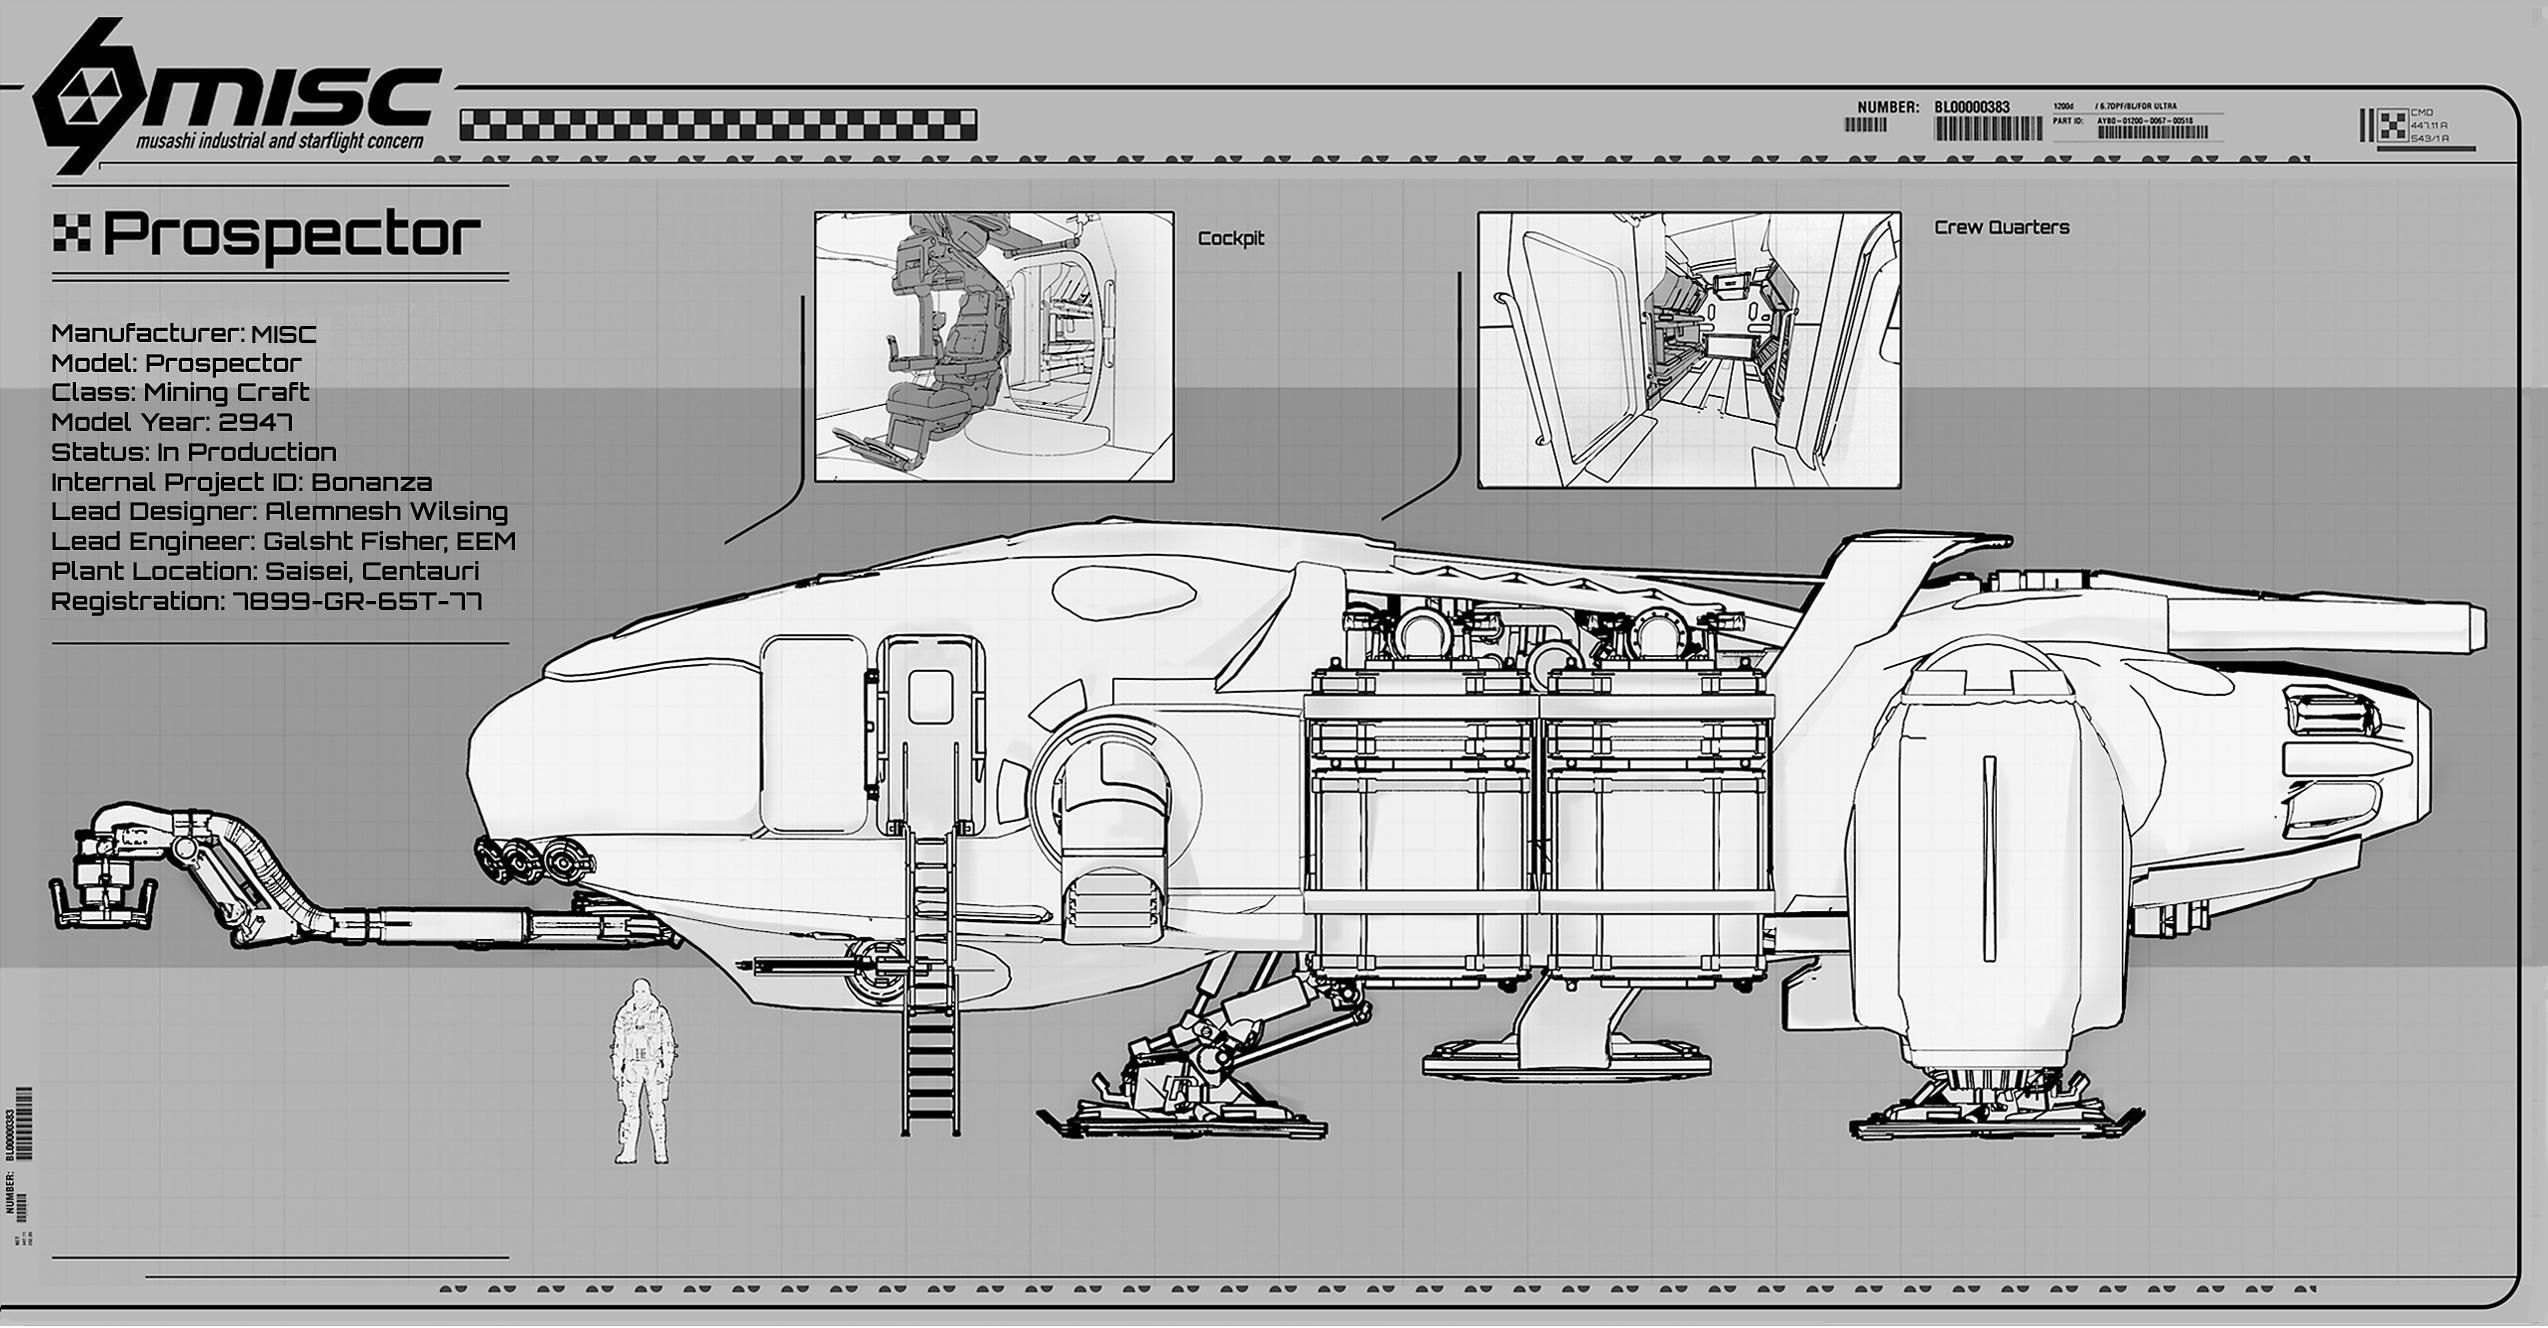 MISC Prospector Blueprint 3.jpg